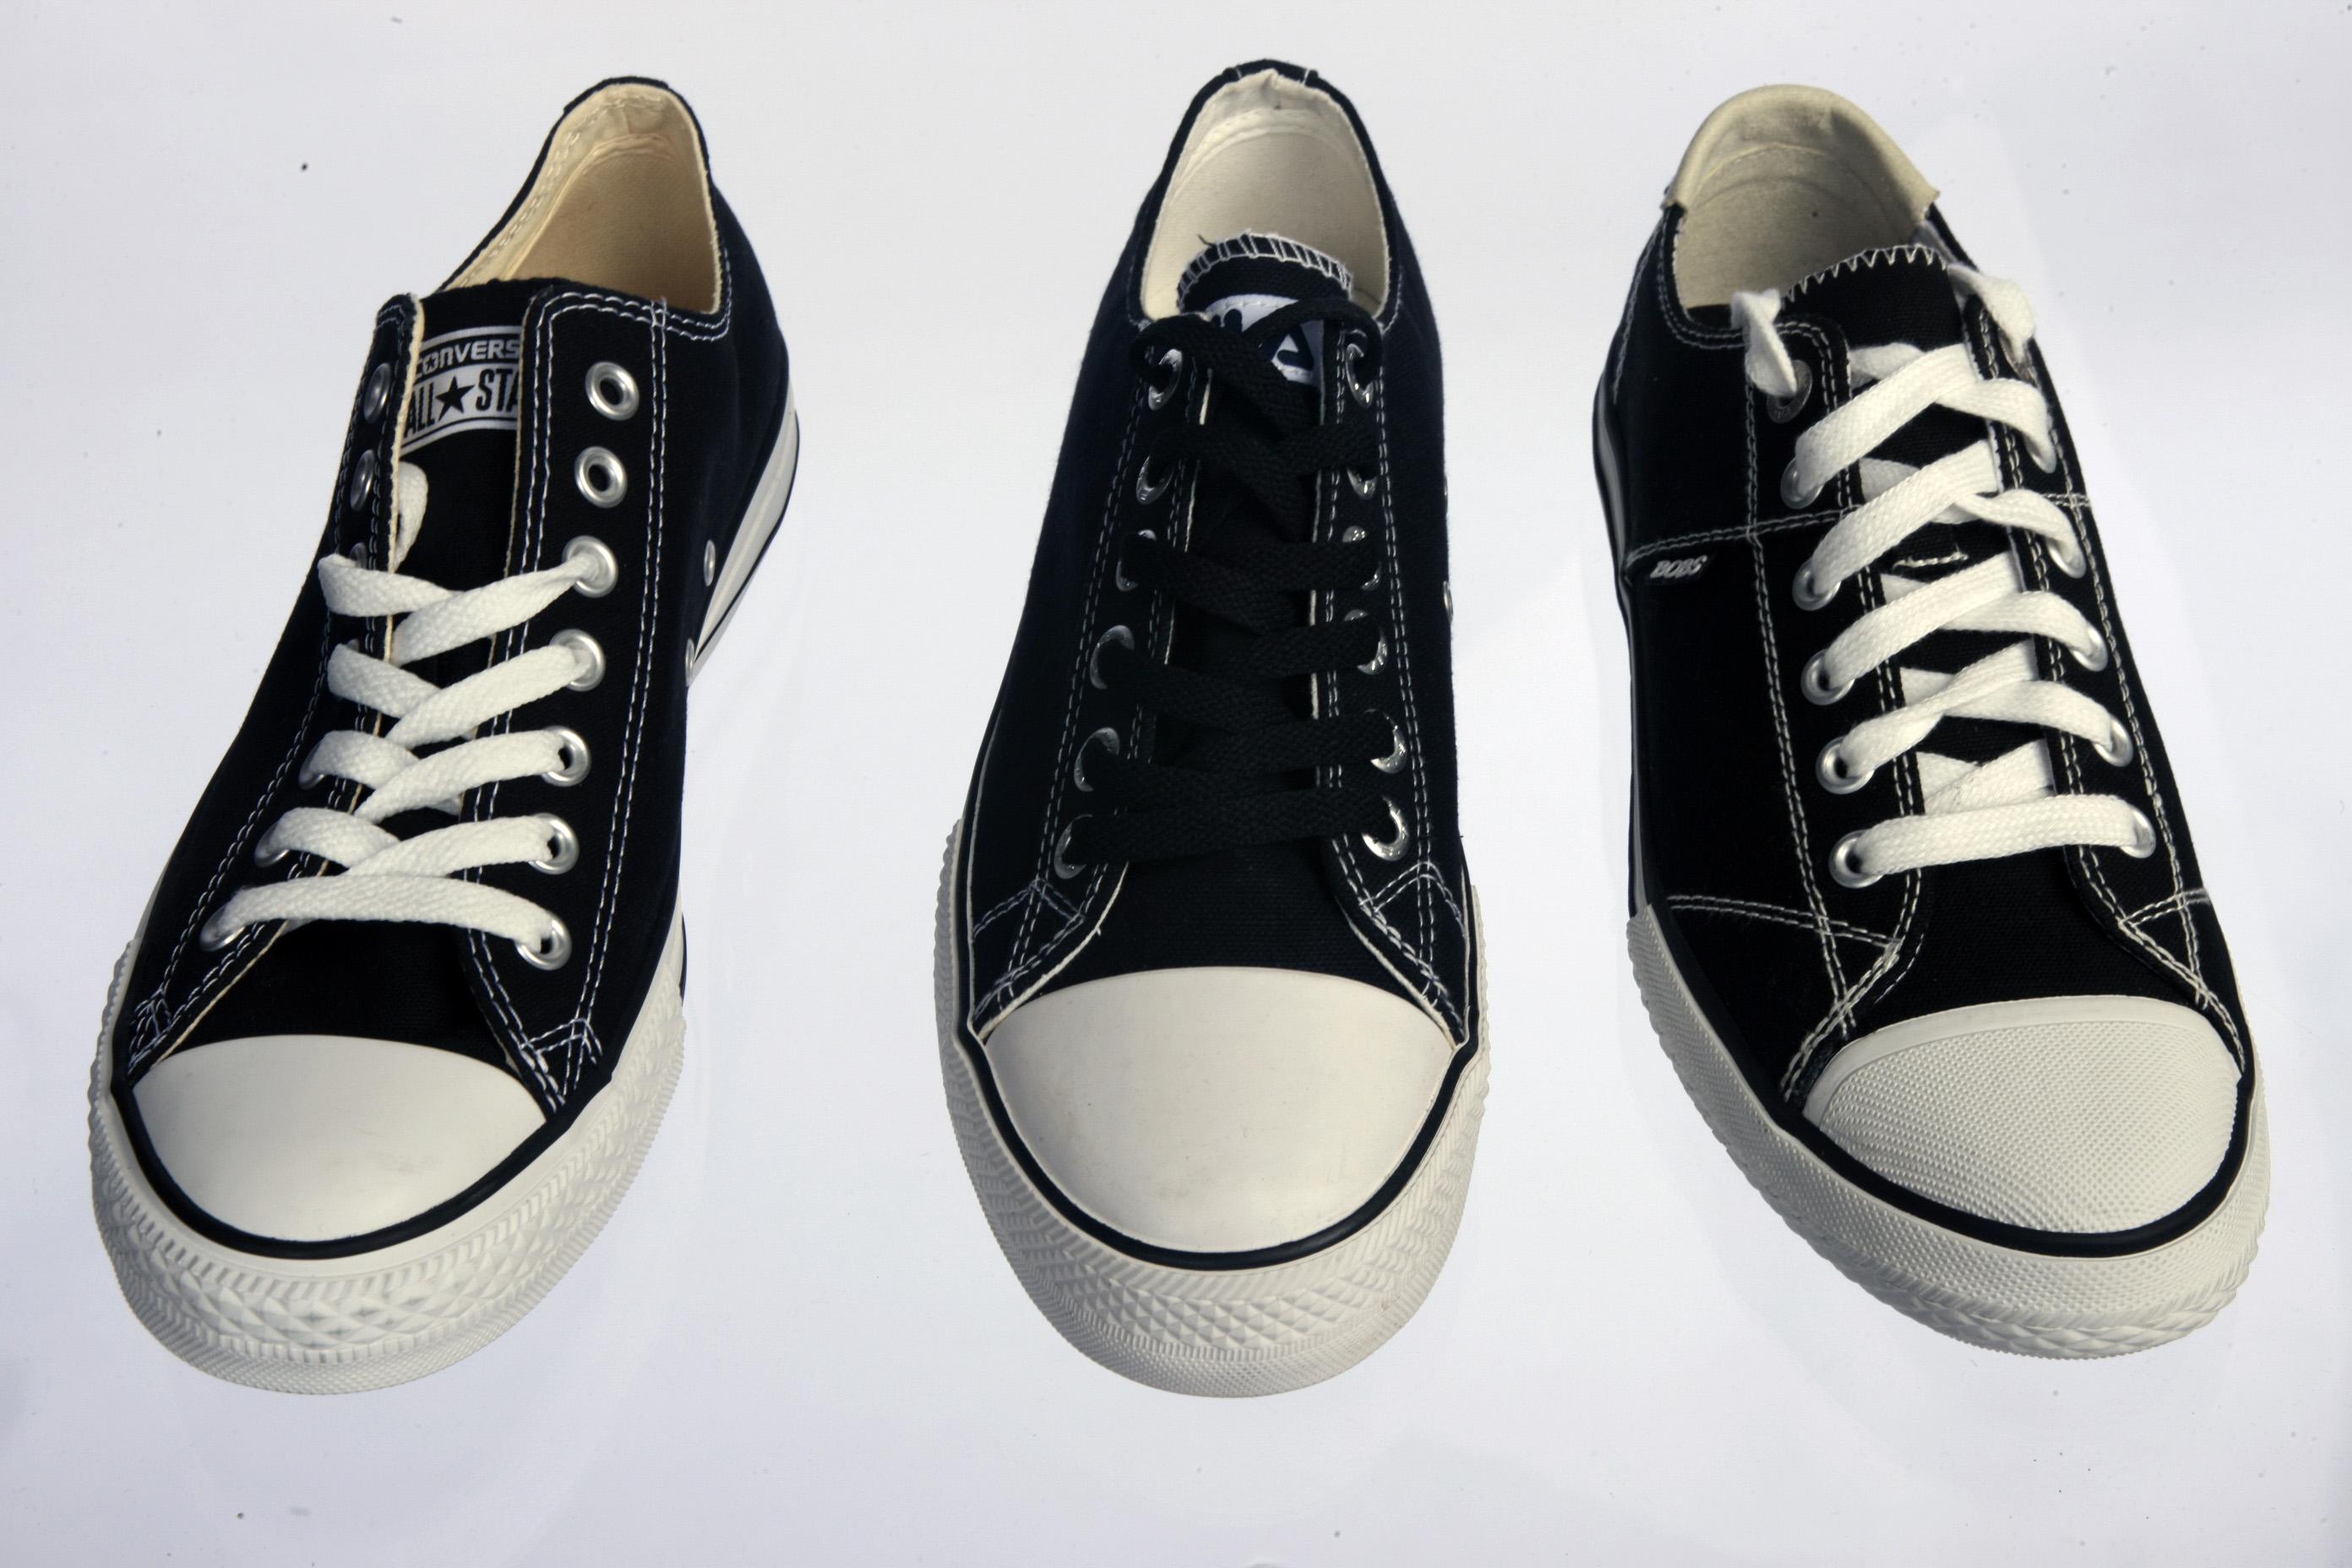 Converse sues retailers over imitation